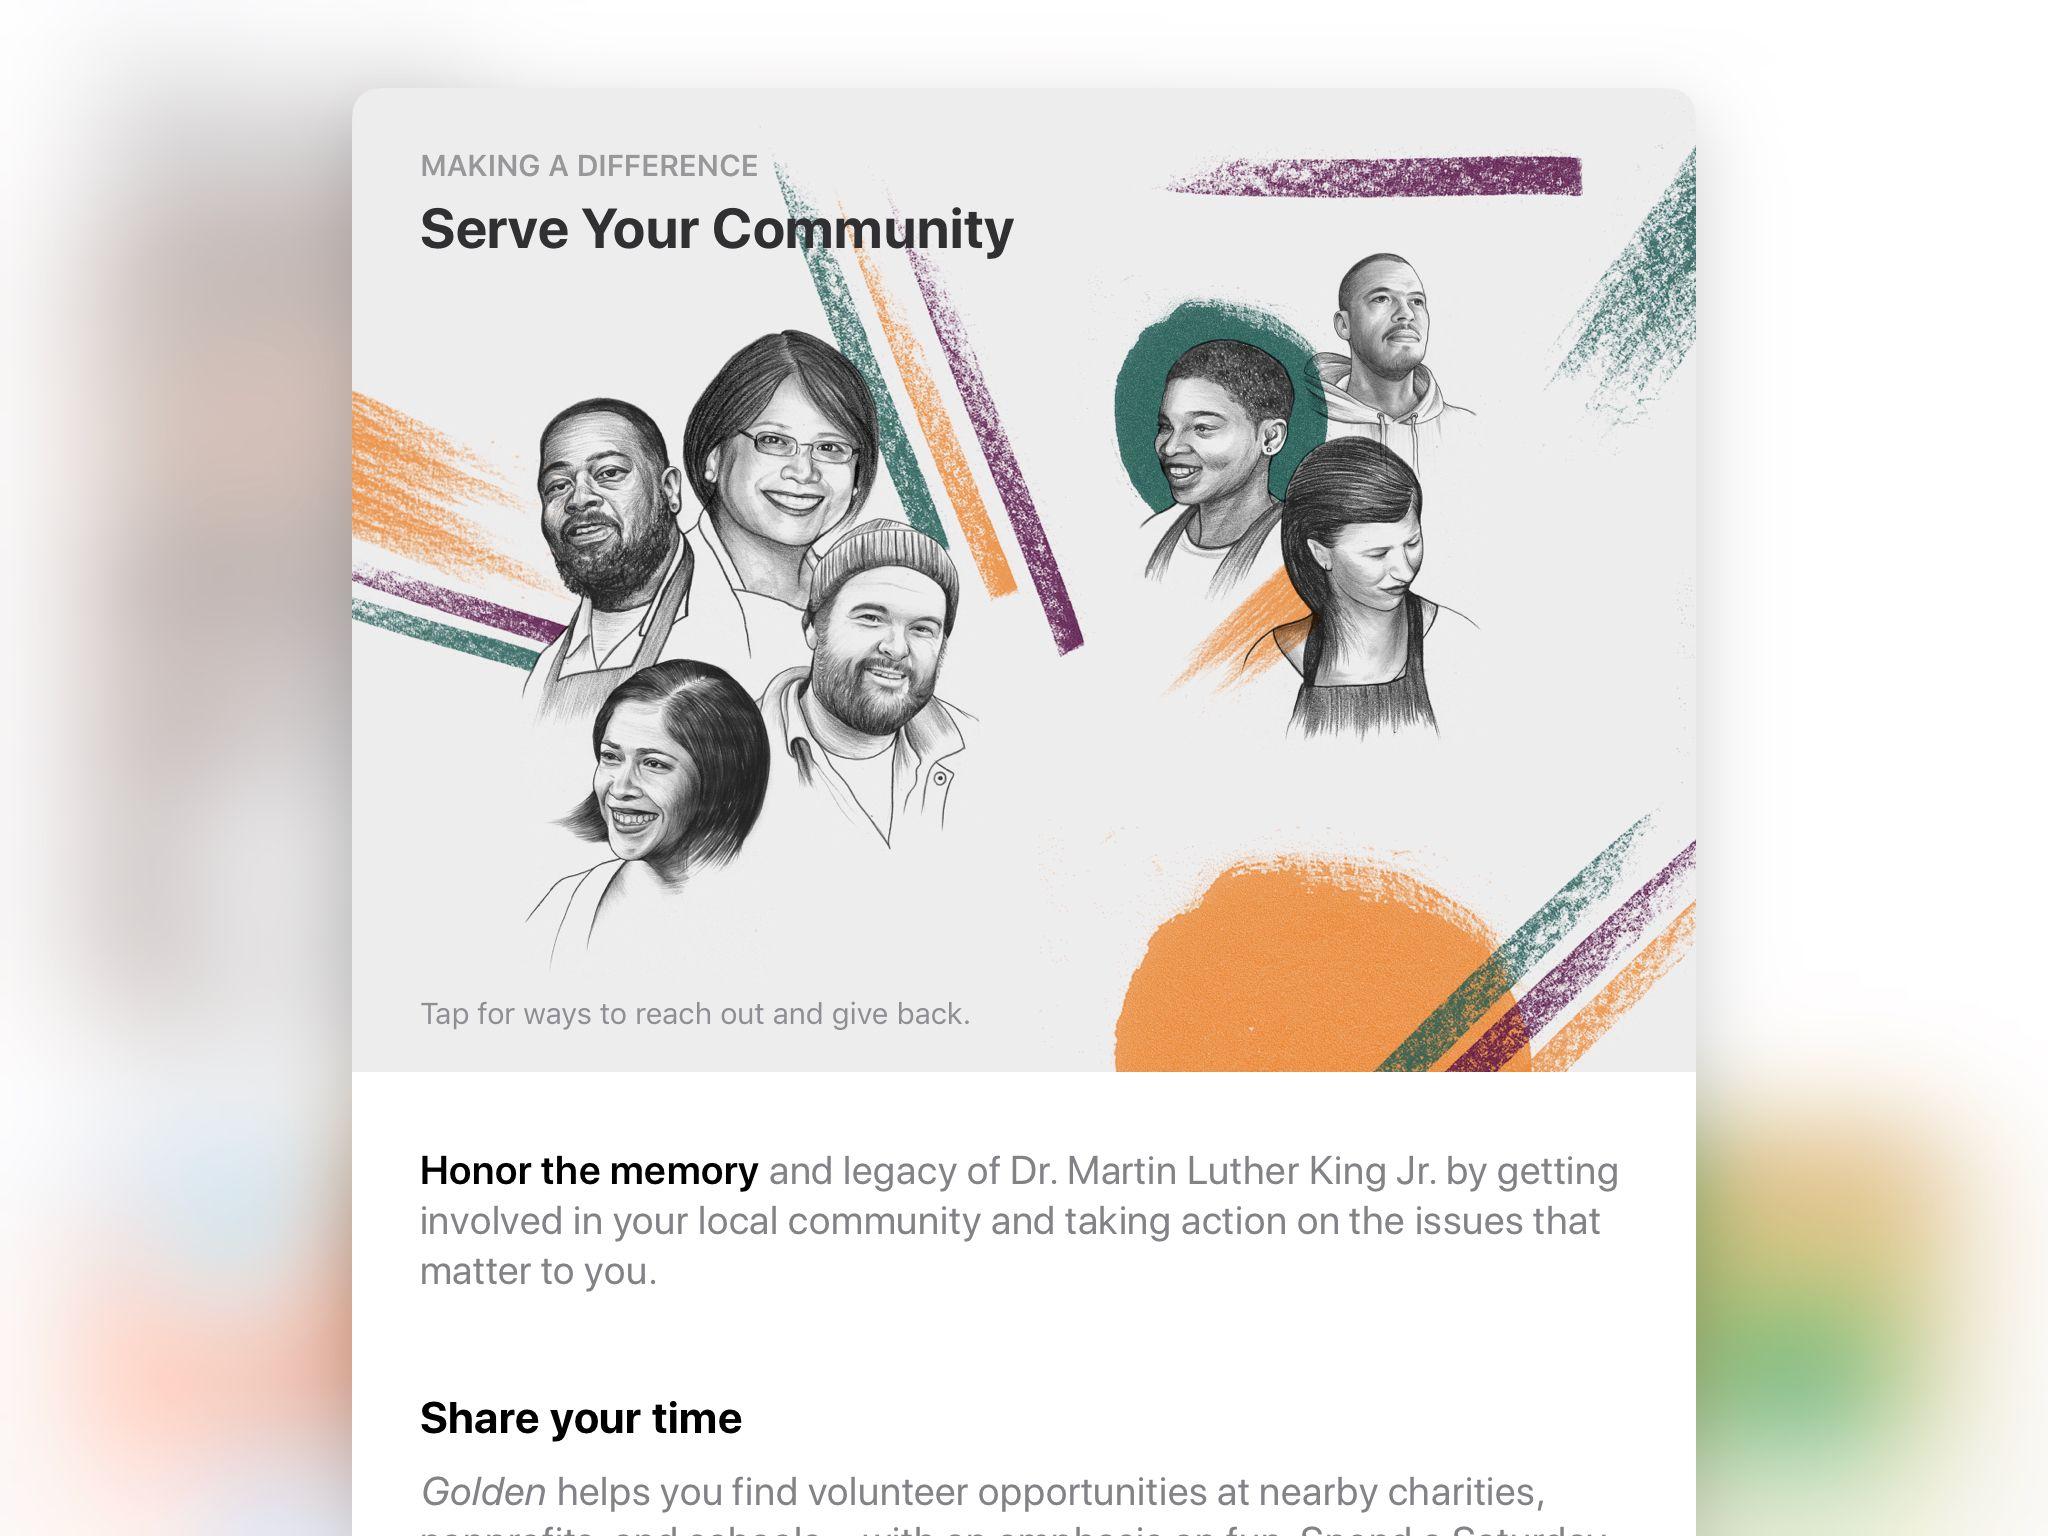 2018-05-22-app-store-serve-01.jpg